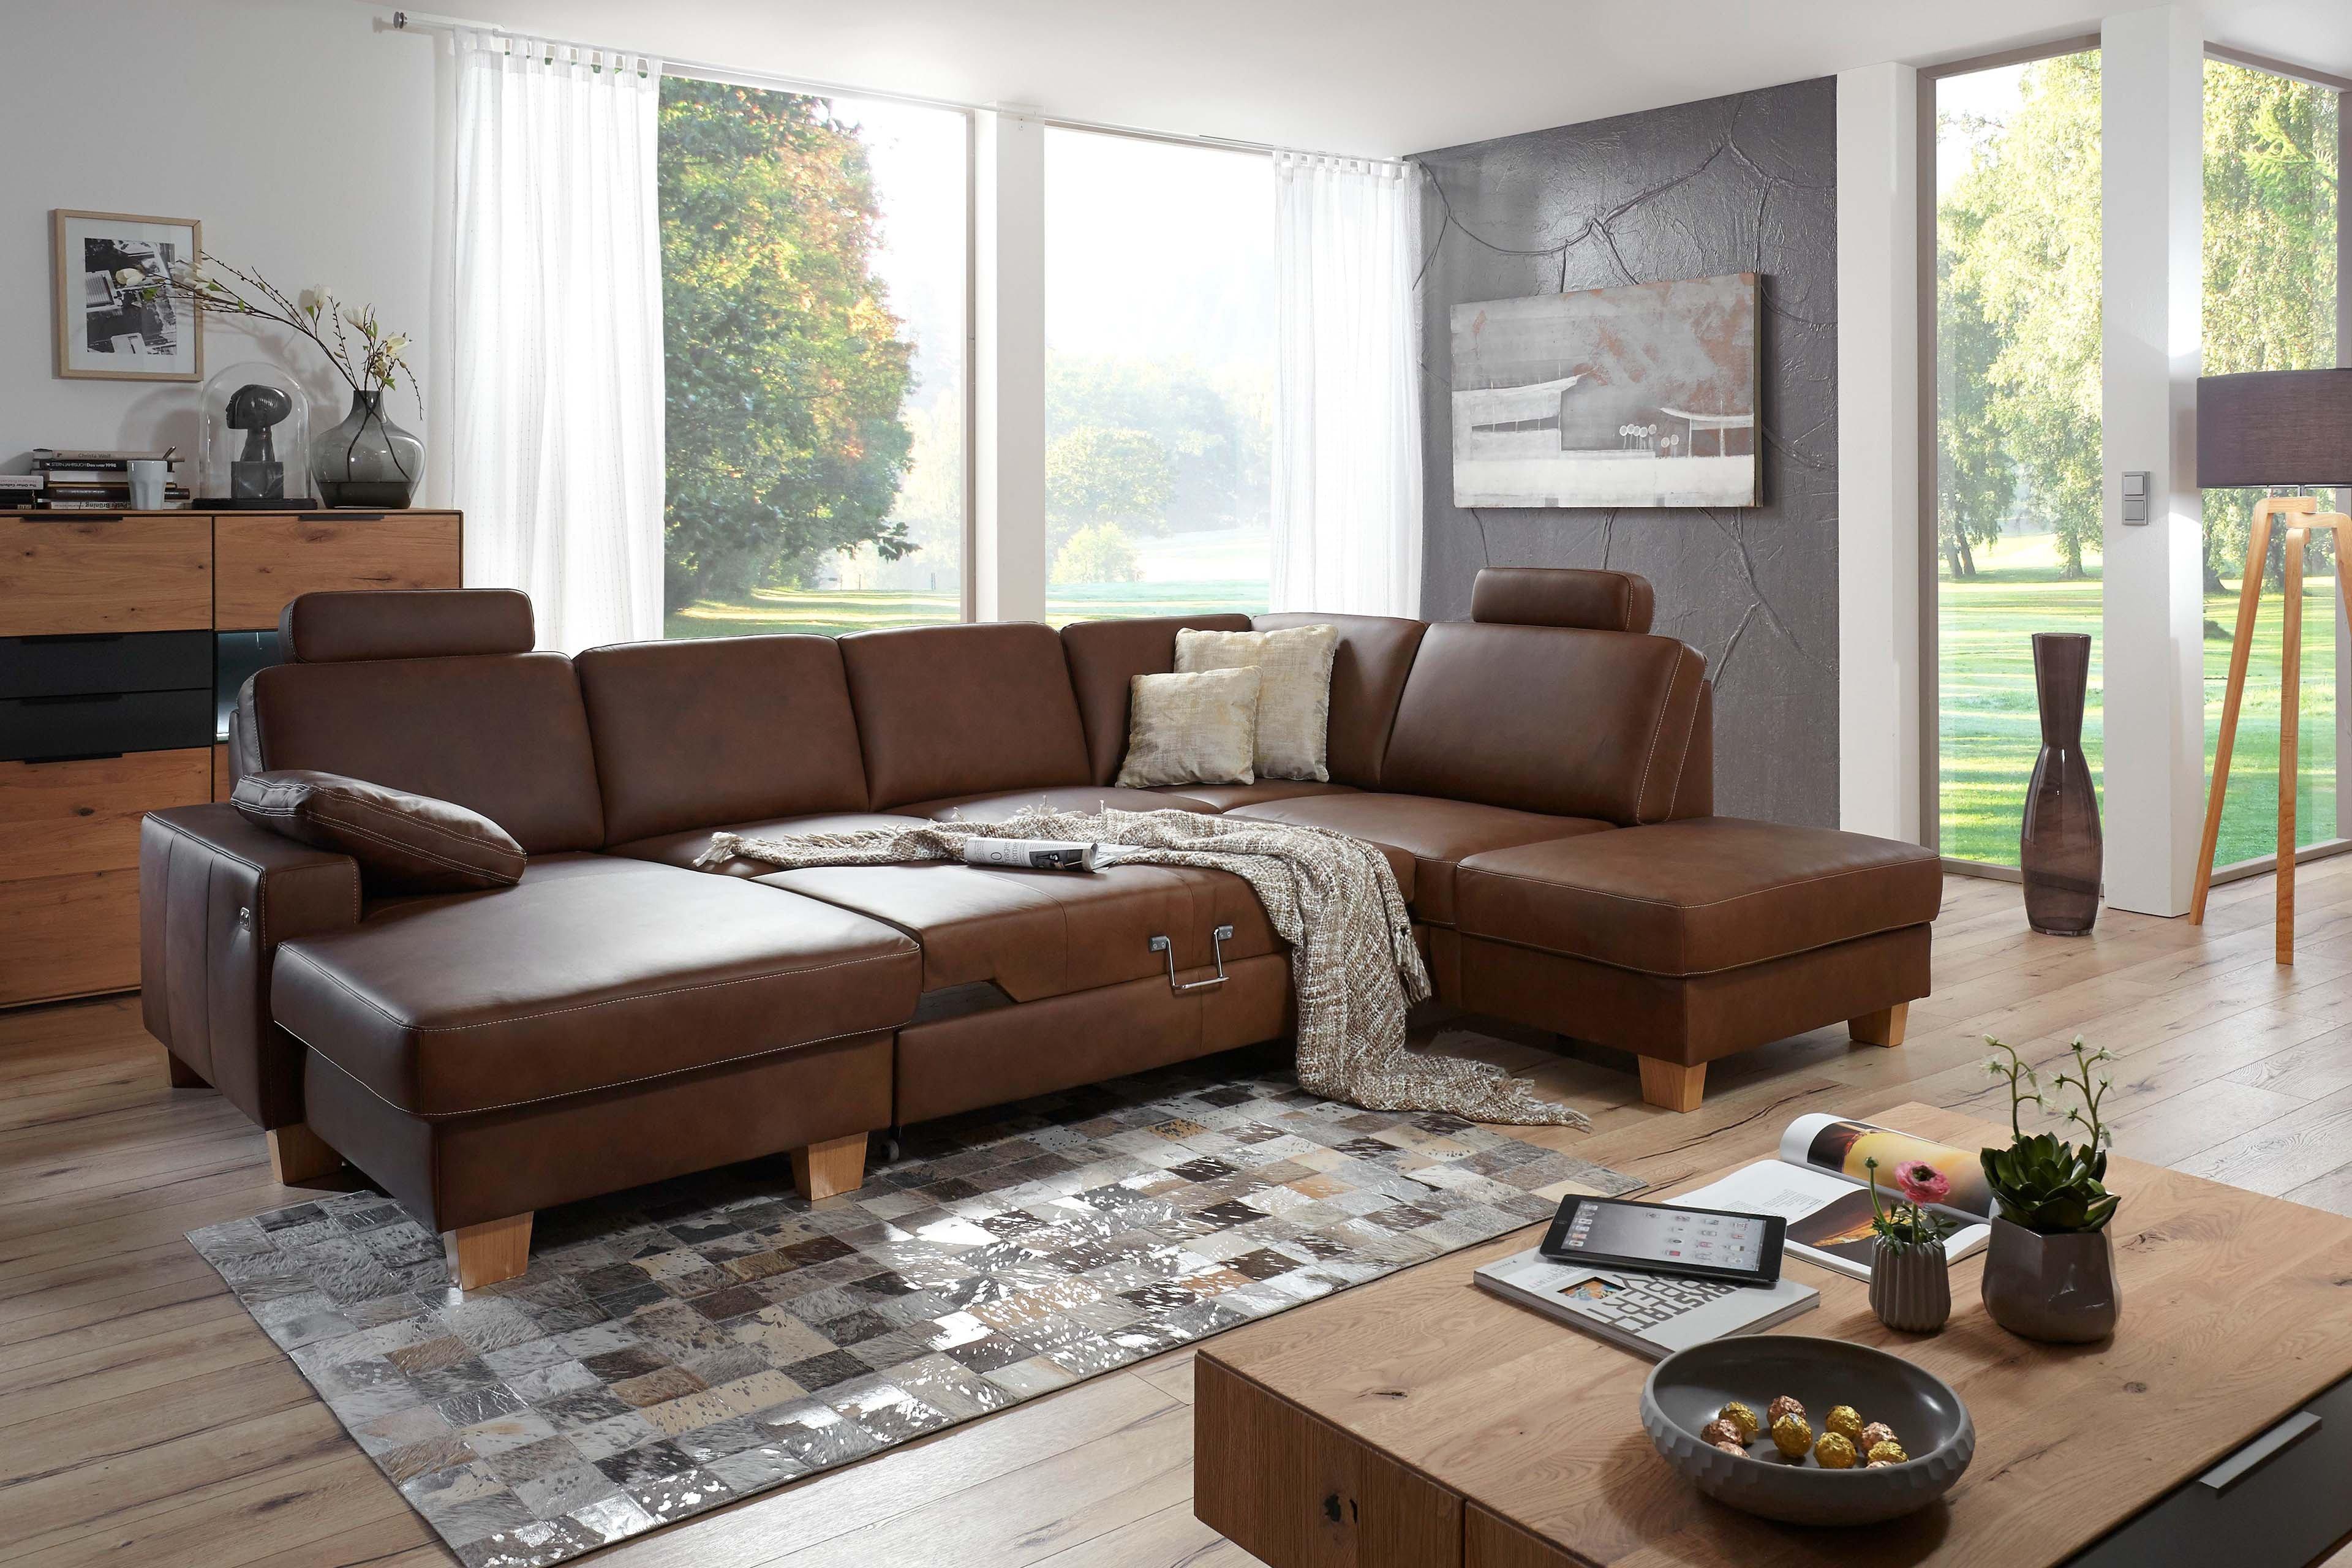 polinova symphony wohnlandschaft braun m bel letz ihr online shop. Black Bedroom Furniture Sets. Home Design Ideas